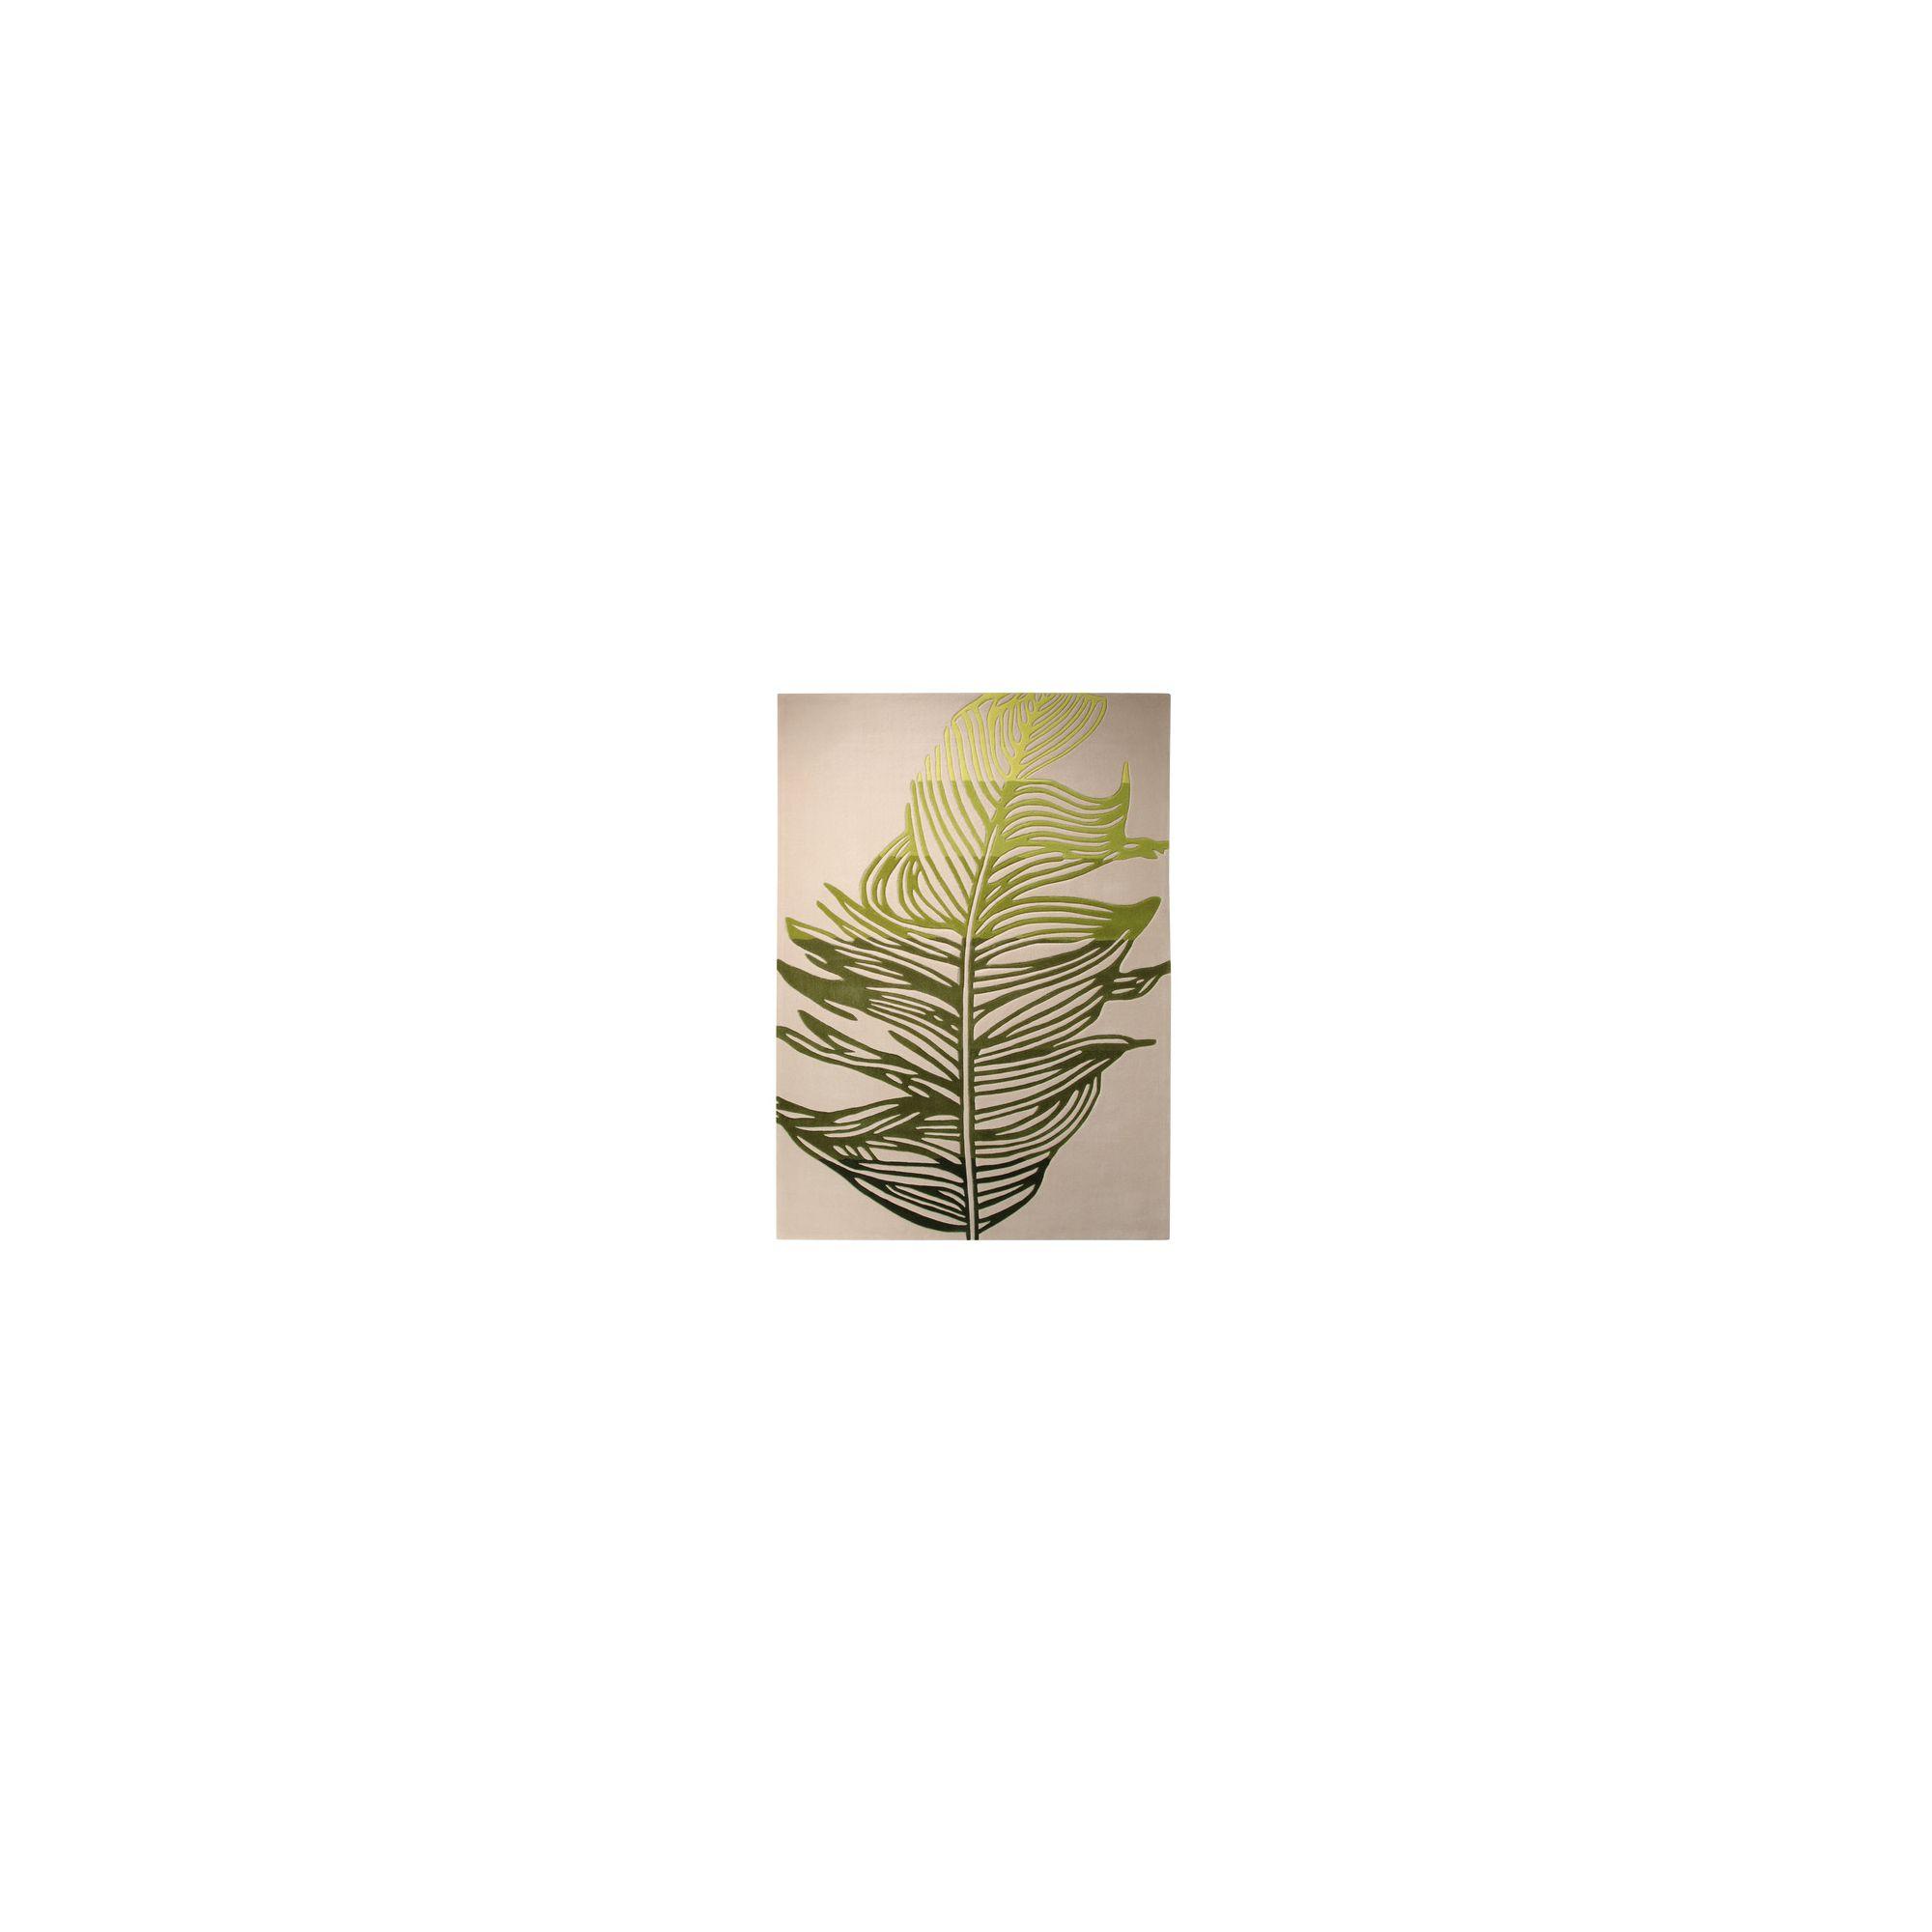 Esprit Feather Beige / Green Novelty Rug - 170cm x 240cm